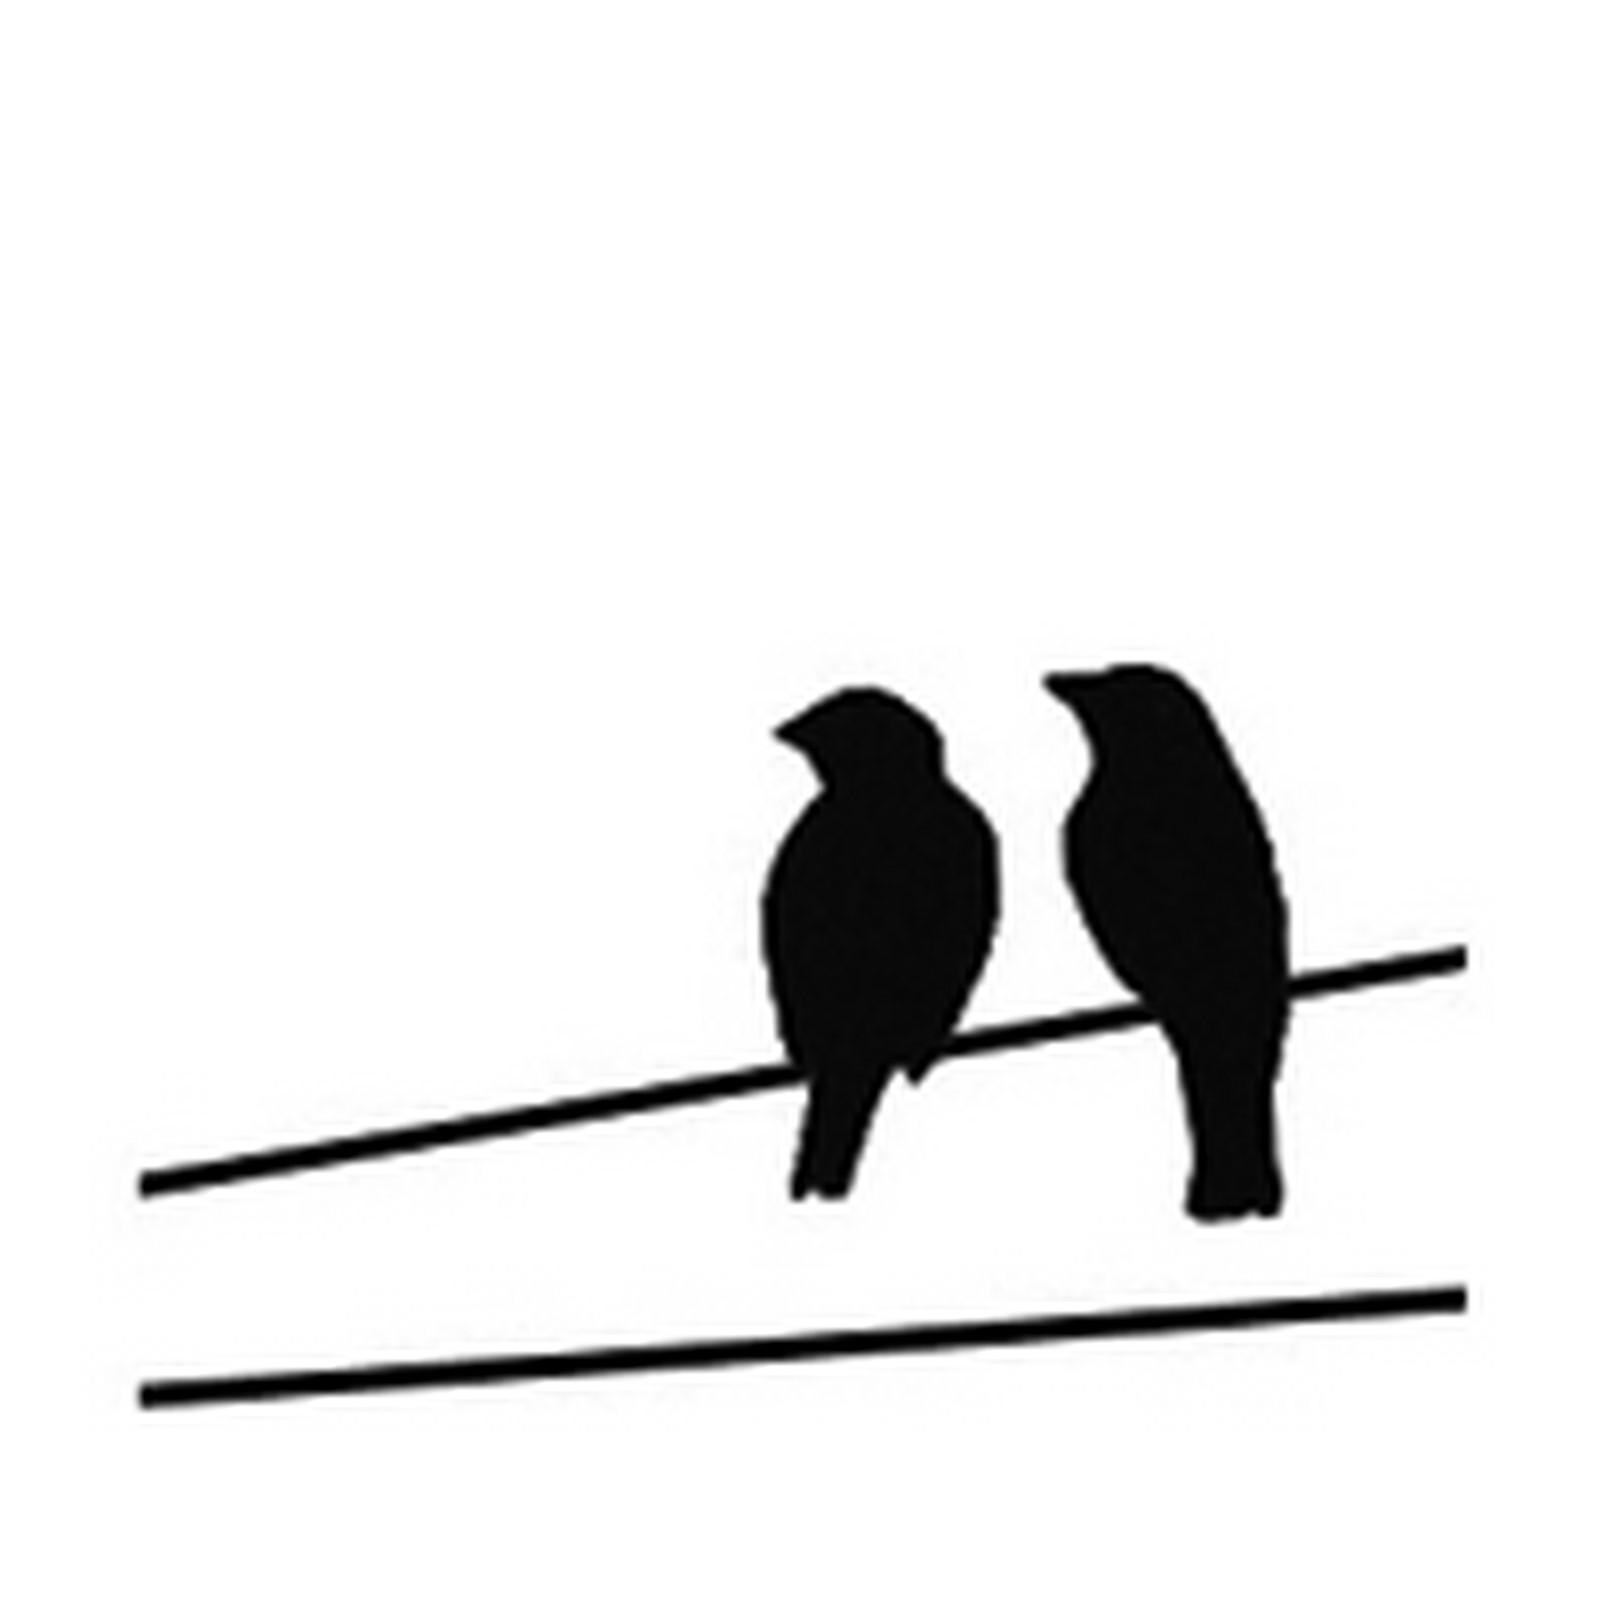 1600x1600 Fusing Decal 1.5x1.25 Black Birds On A Wire Animals 1 12 X